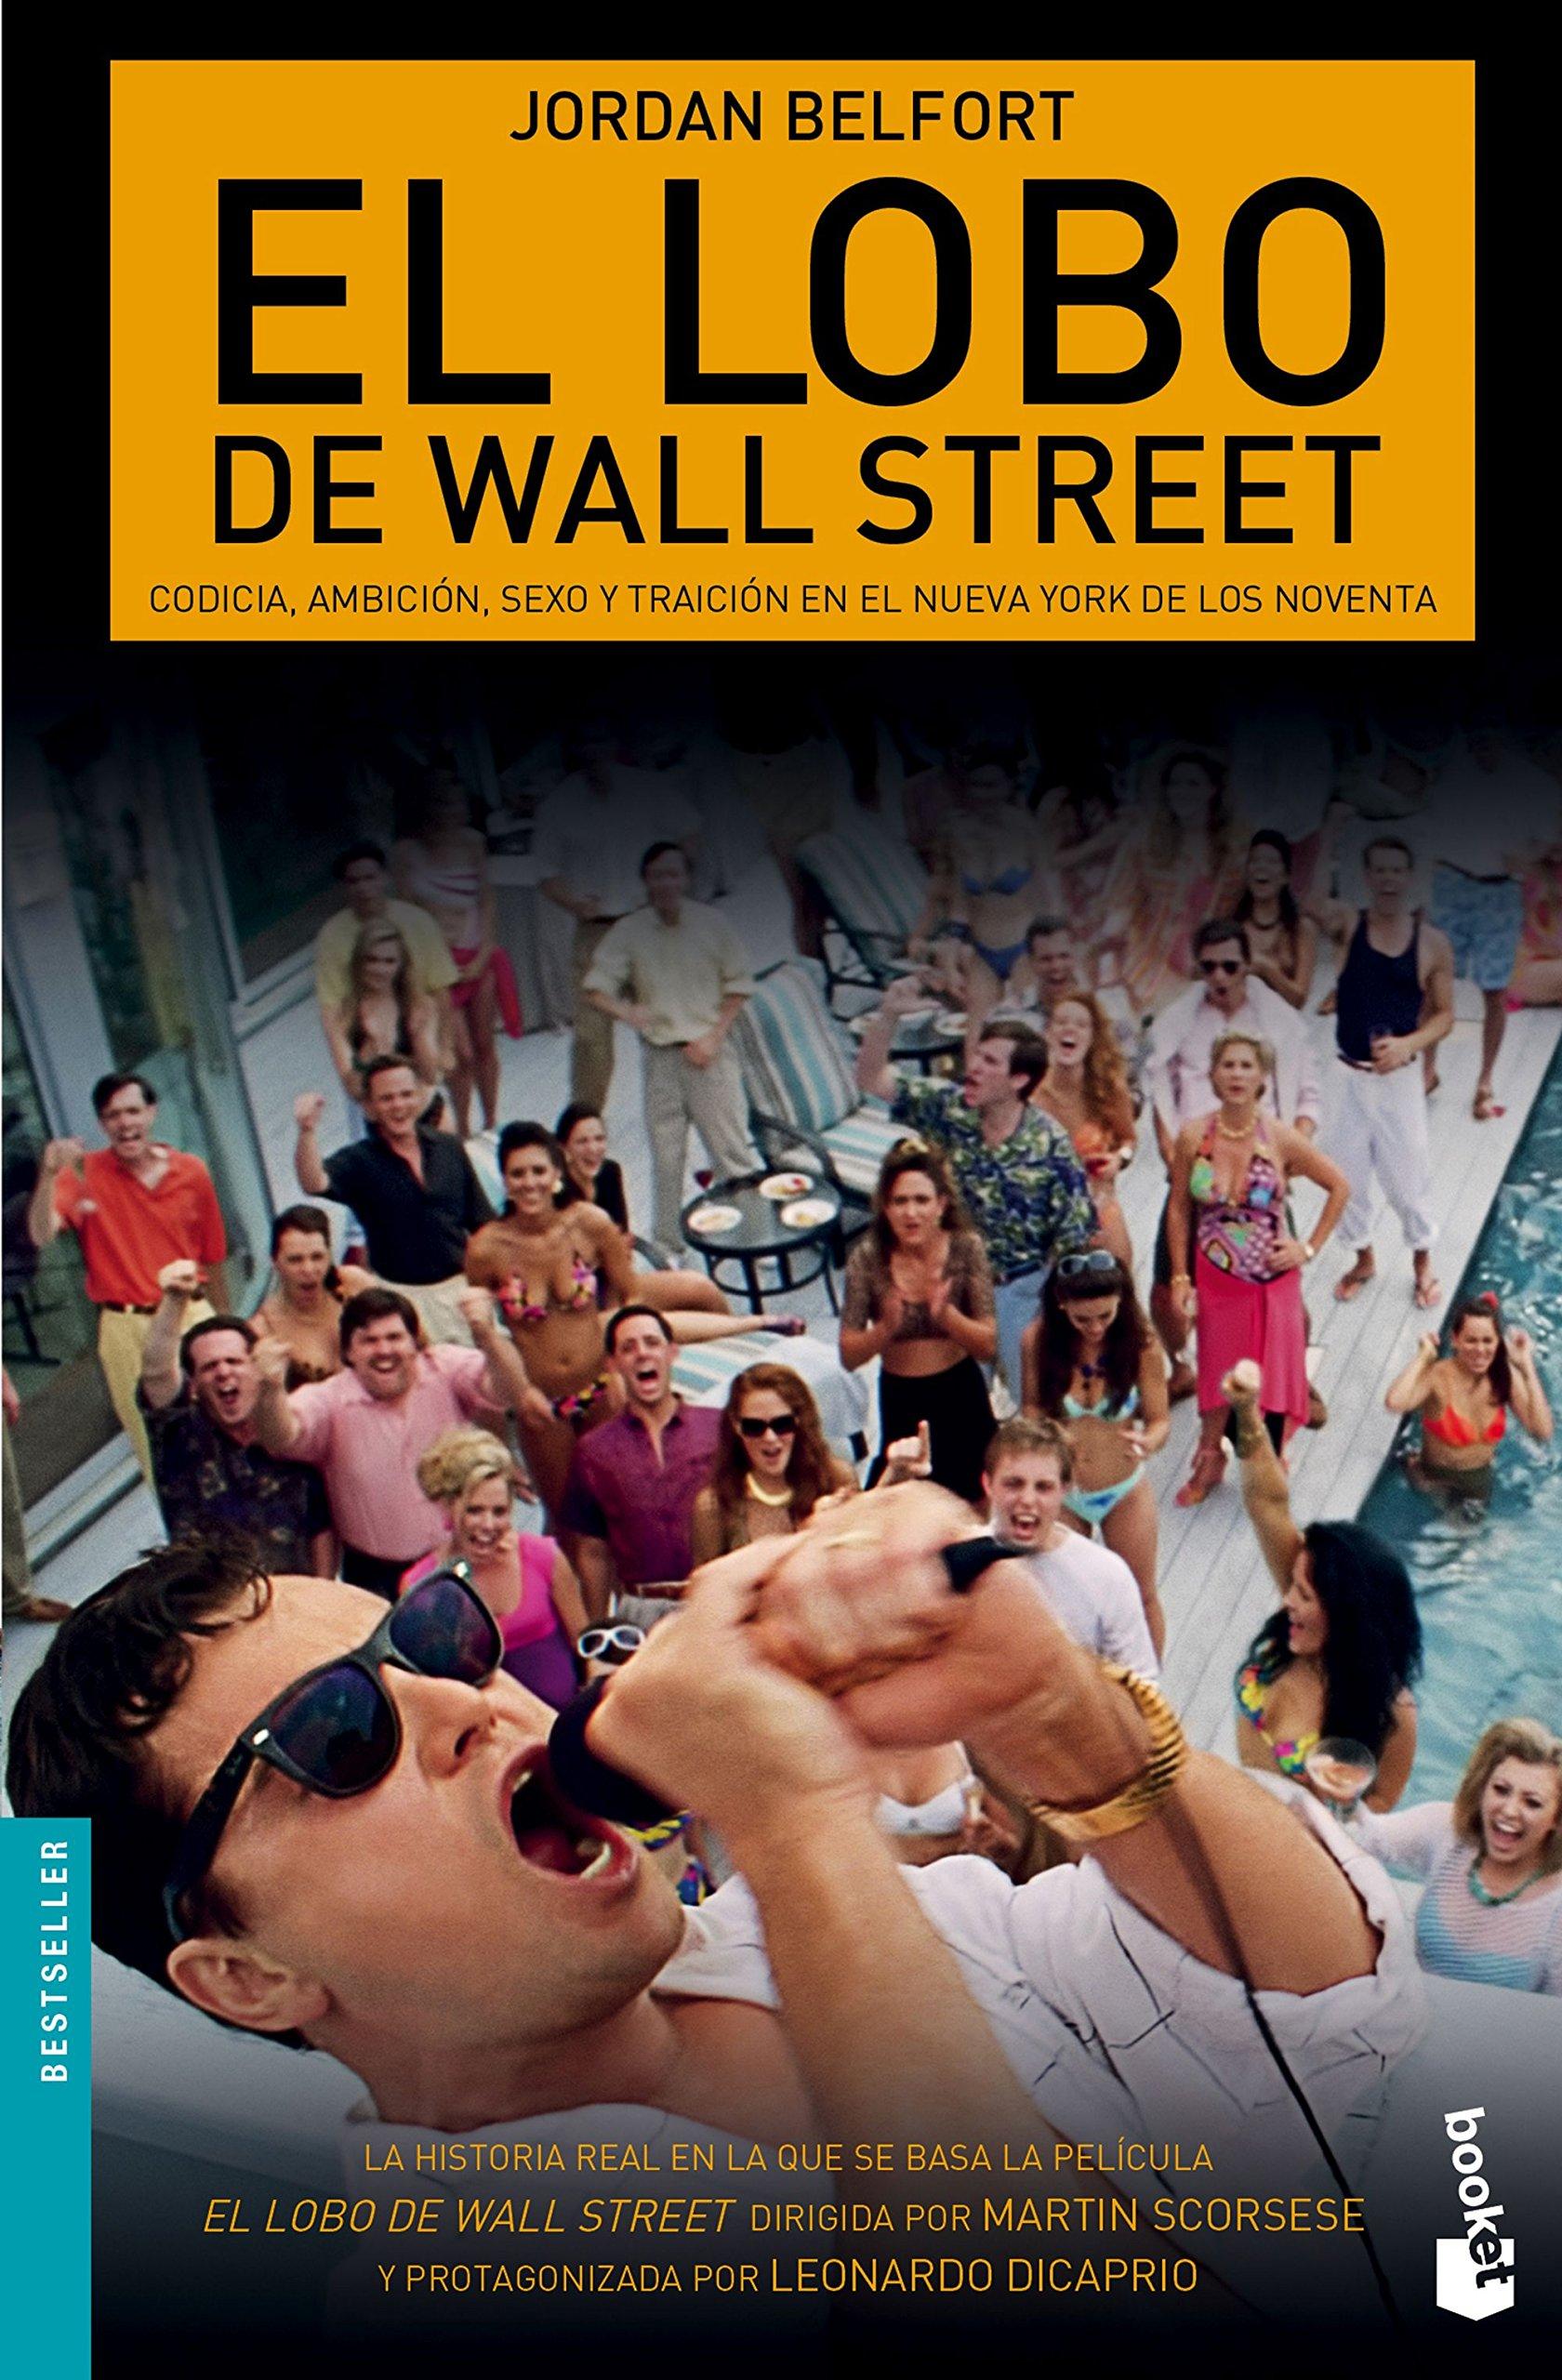 El lobo de Wall Street (Bestseller) (Spanish Edition): Belfort, Jordan,  Pico Estrada, Agustín: 9788423420759: Amazon.com: Books